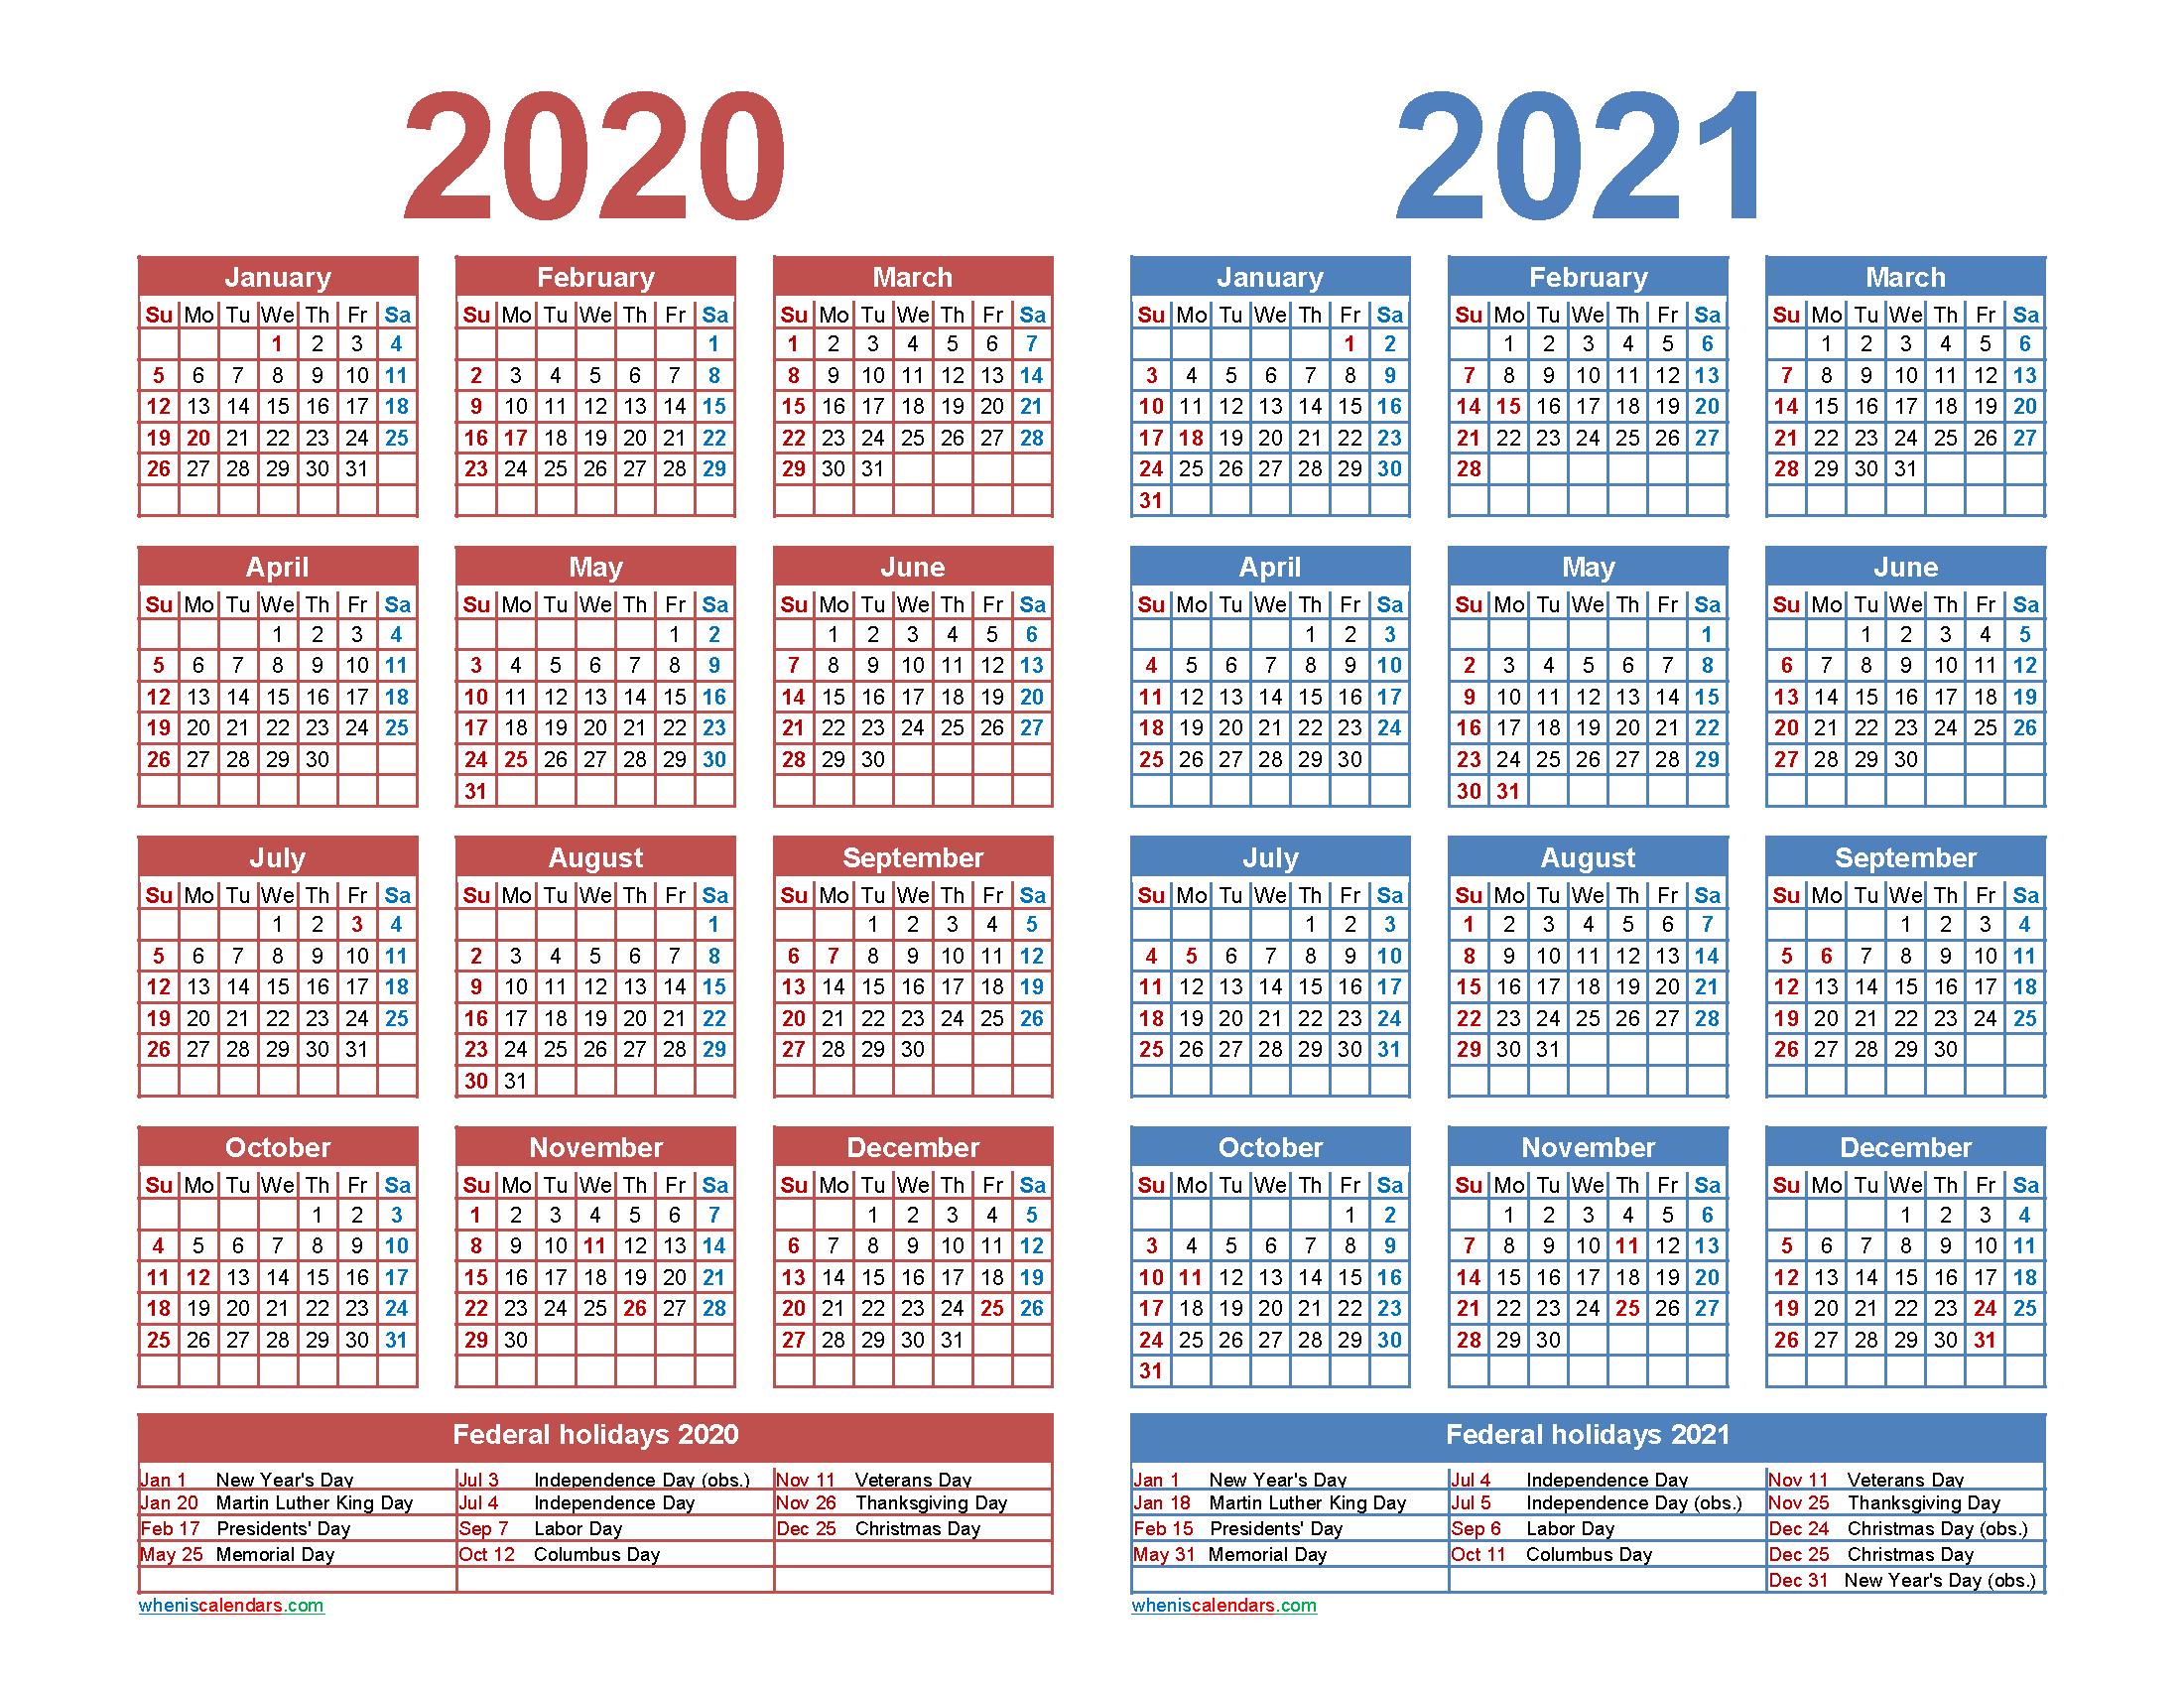 Free 2020 And 2021 Calendar Printable Word Pdf - Free